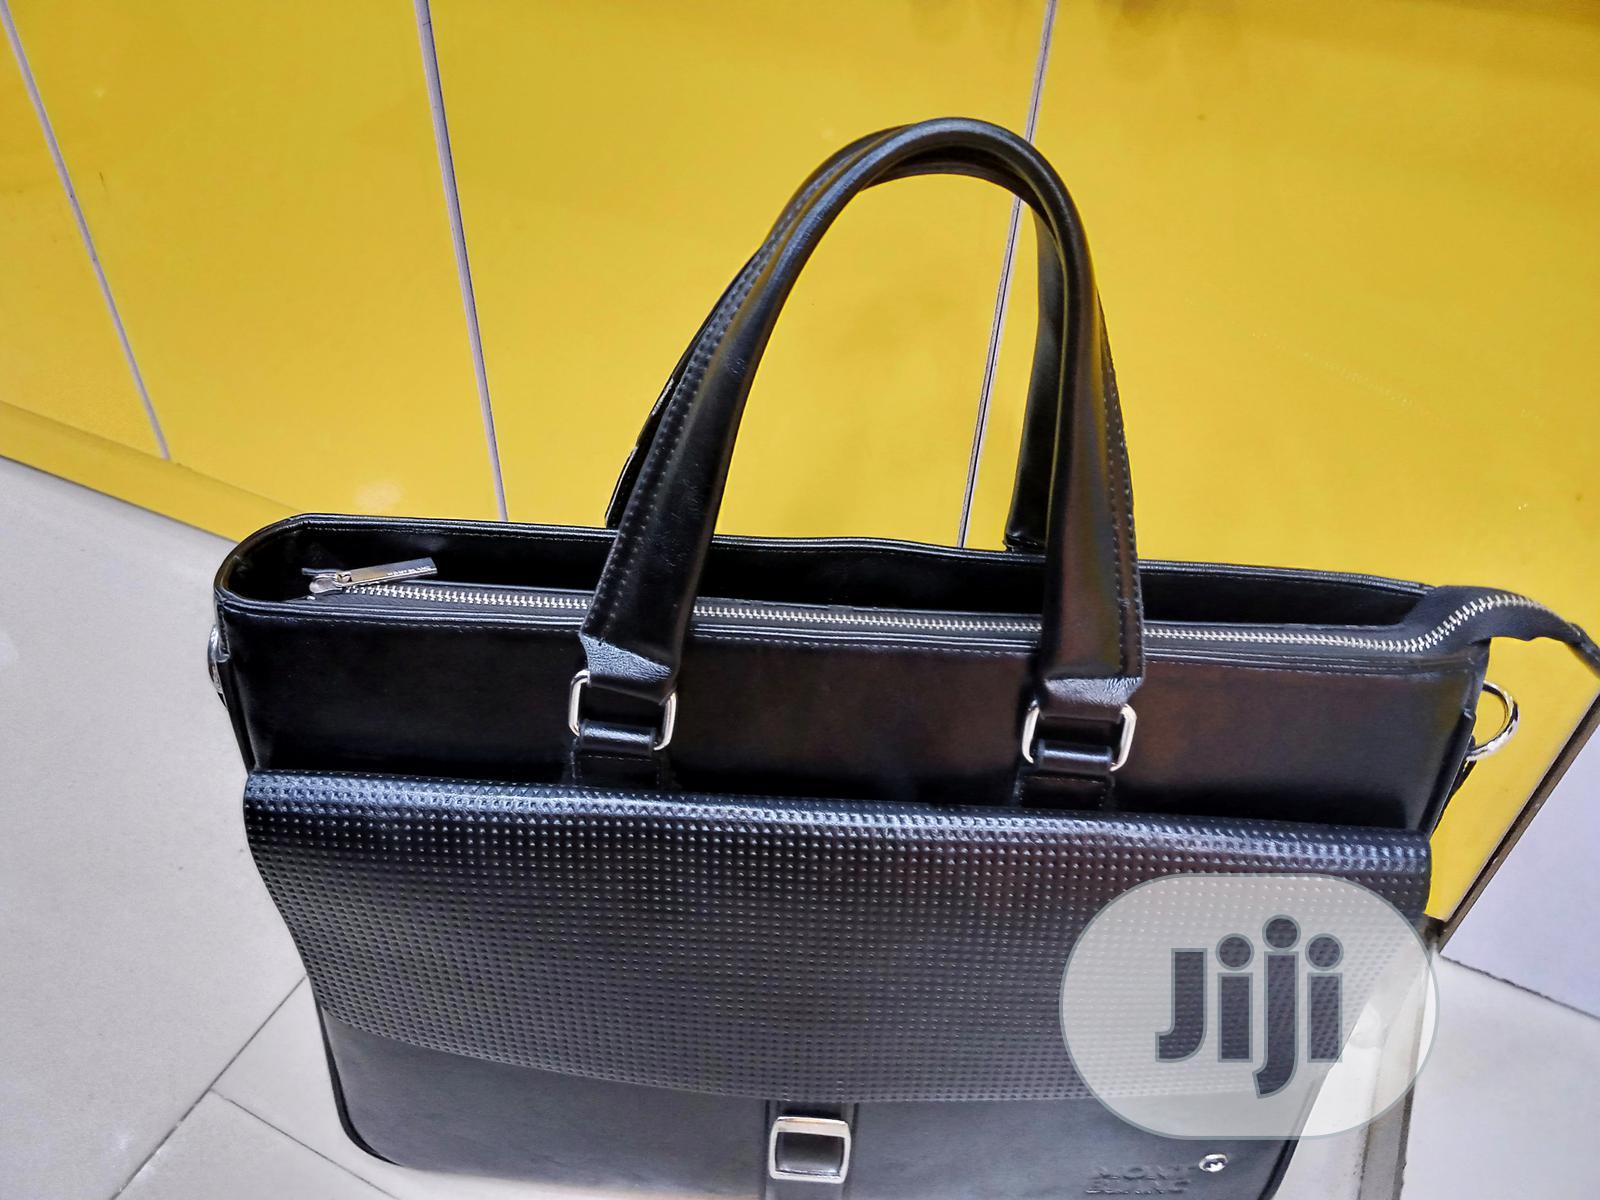 17 Inch Mont Blanc Designer Laptop Bag | Bags for sale in Lagos Island, Lagos State, Nigeria